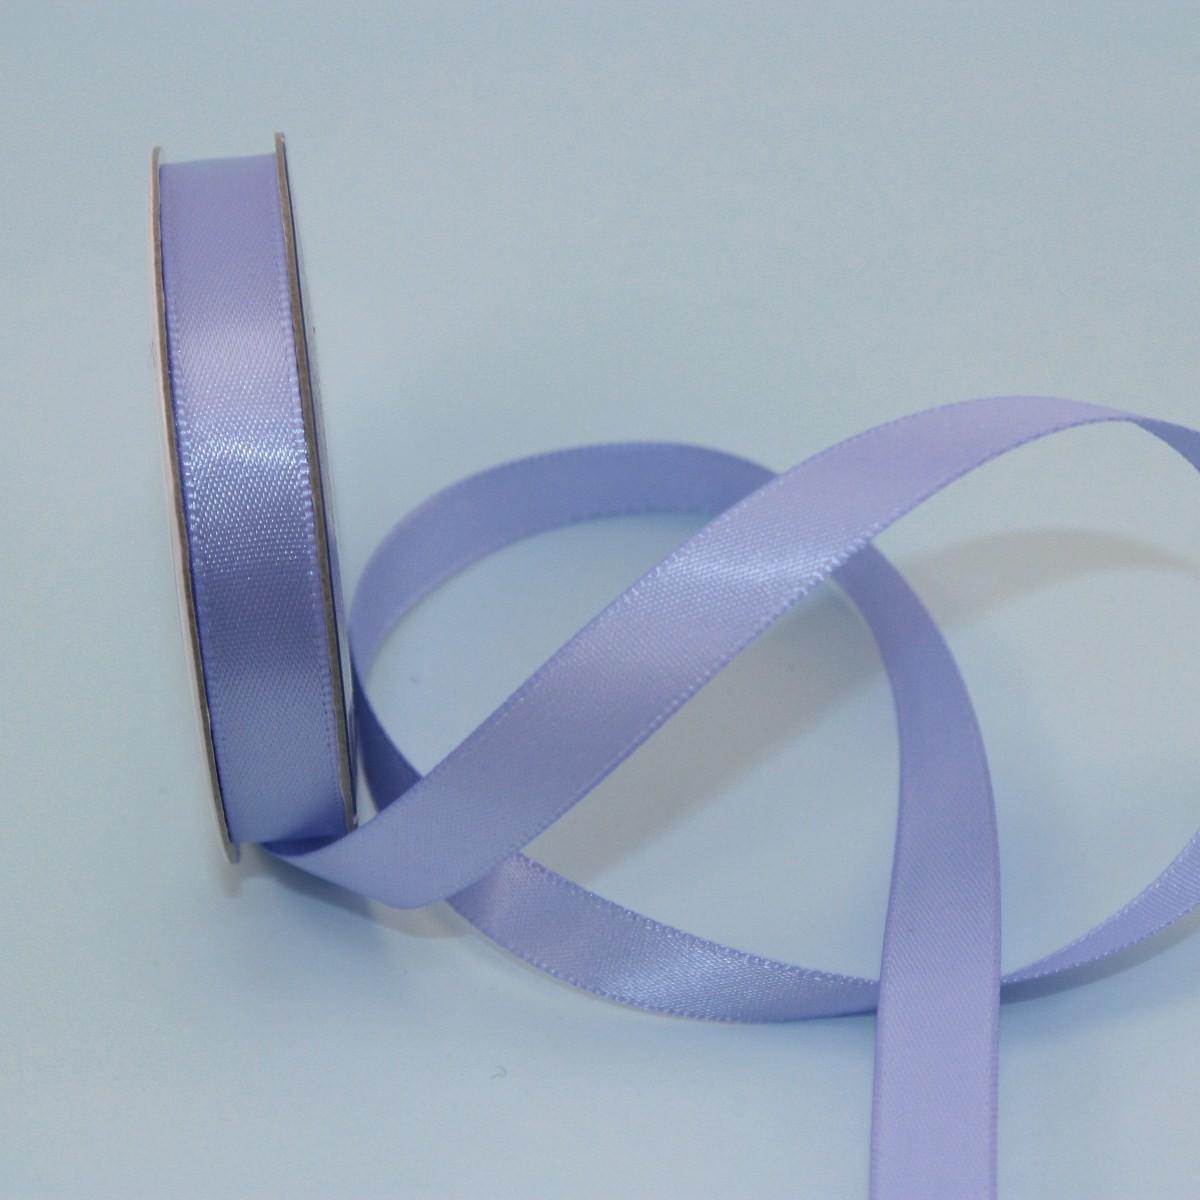 Ruban satin en bobine bleu lavande 9 mm